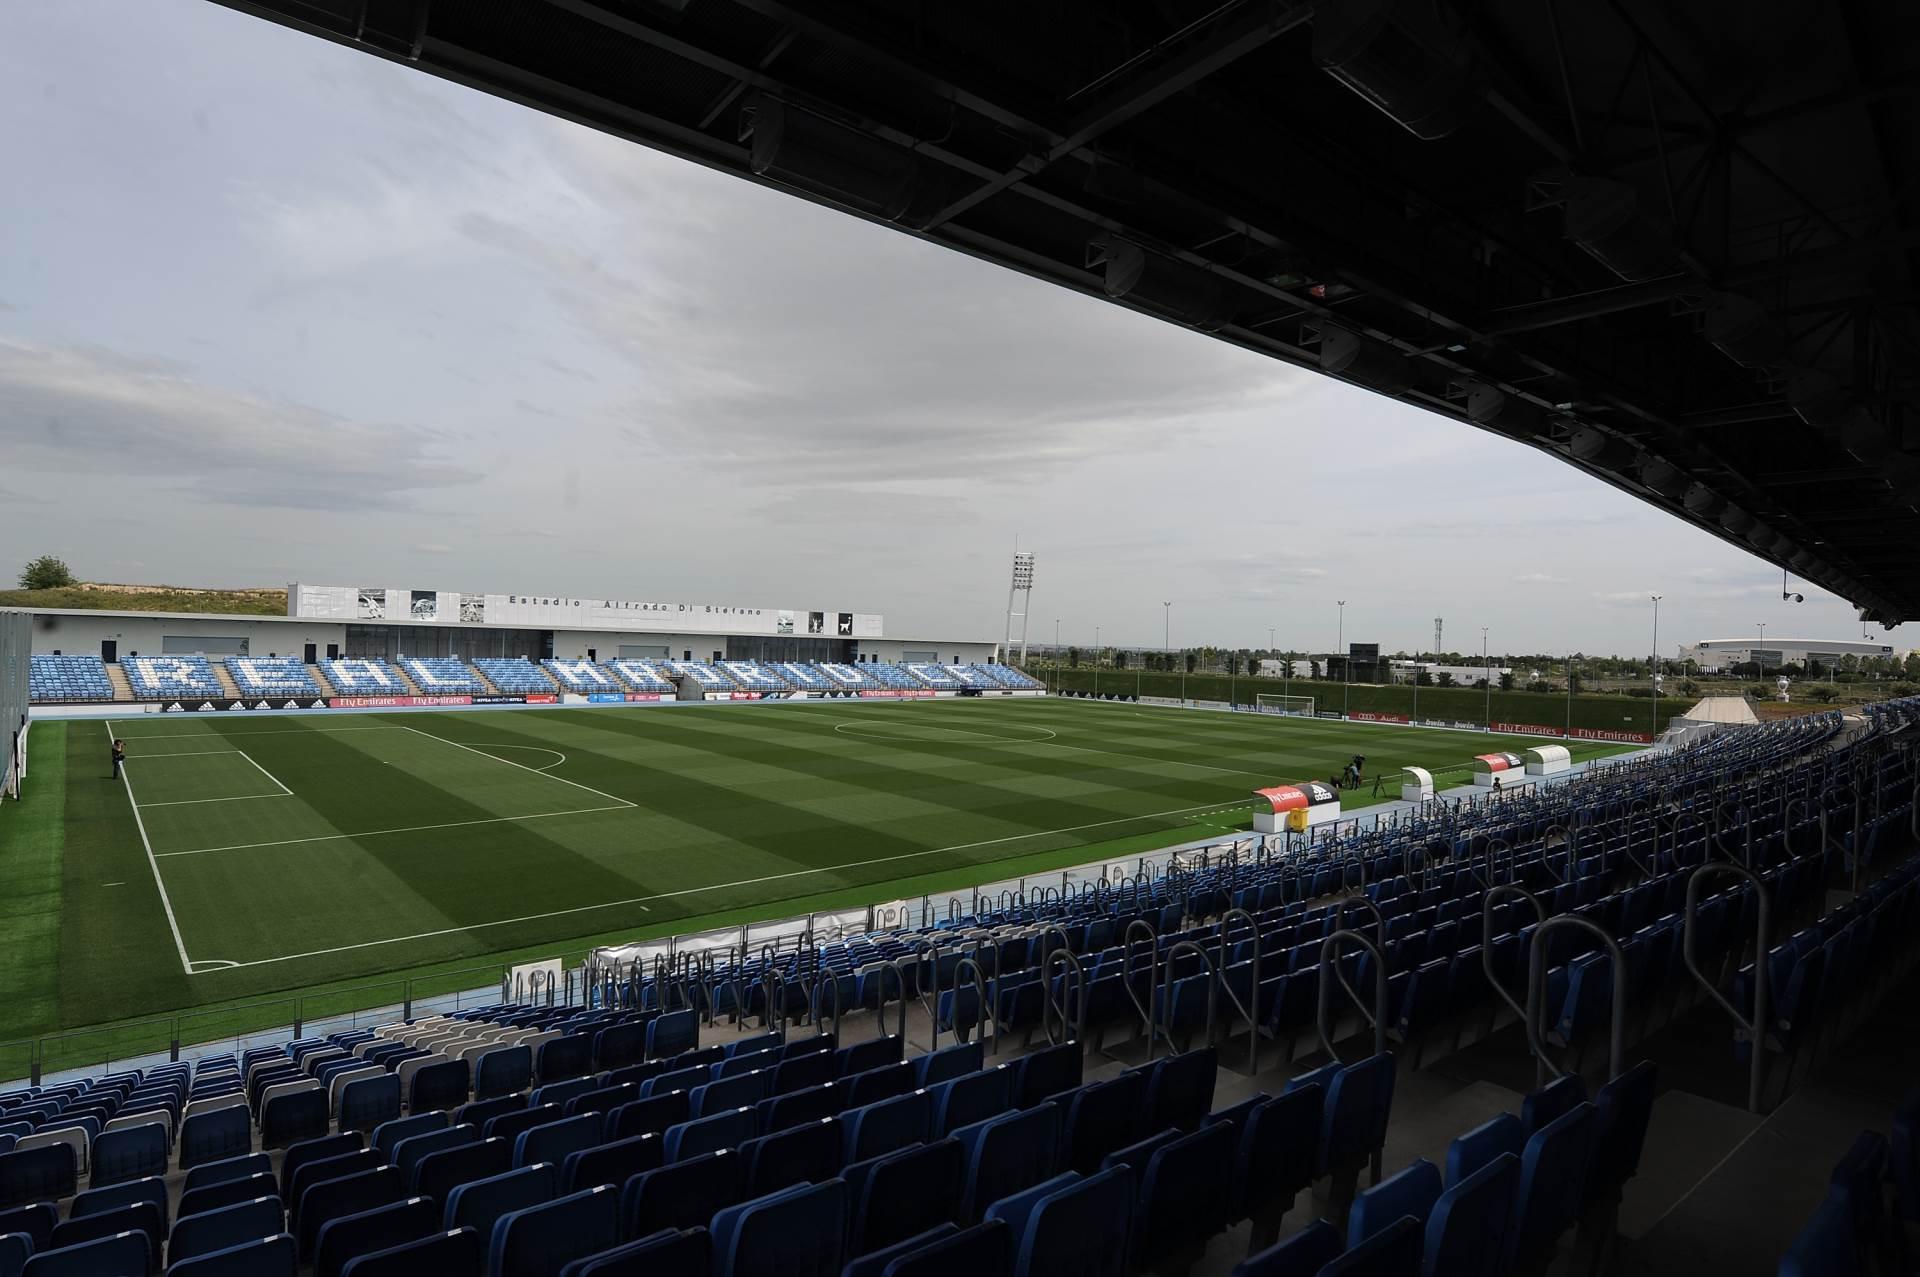 Real Madrid stadion Alfredo di Stefano